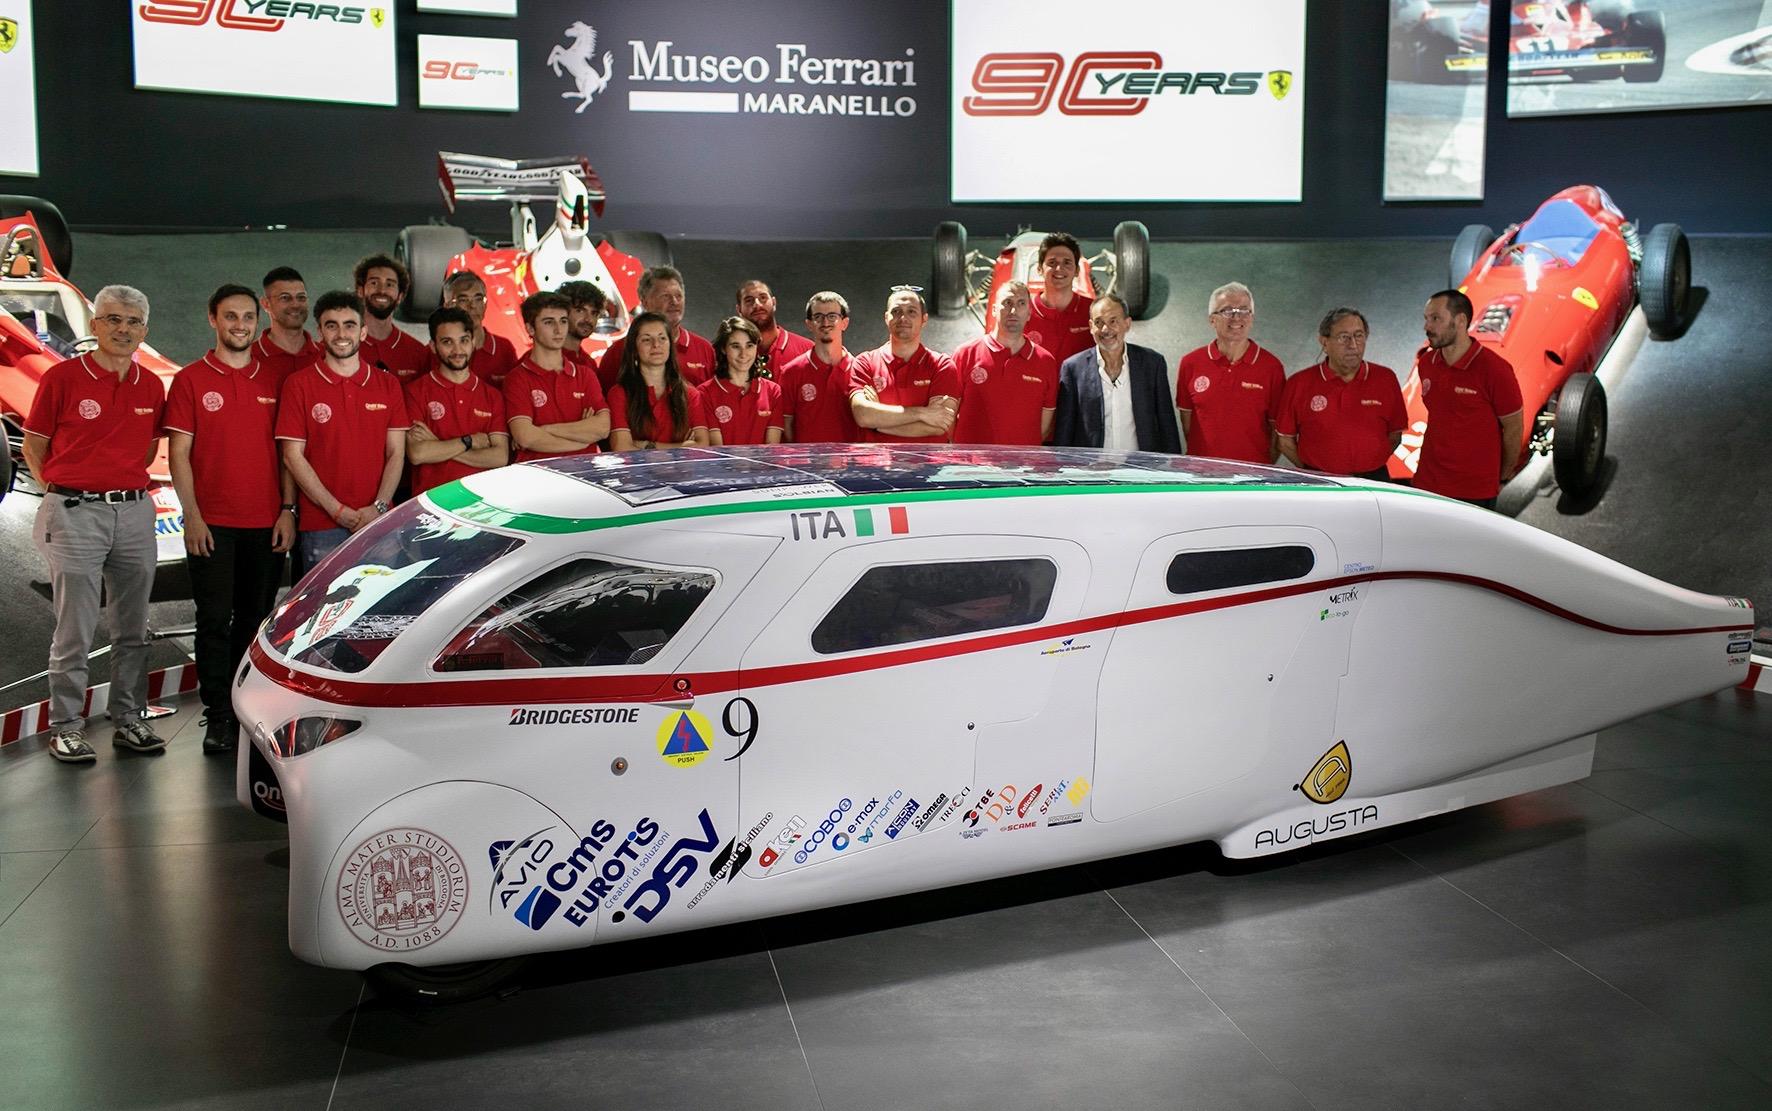 LeMay museum, LeMay hosts tuner show featuring Japanese Porsche specialist Akira Nakai, ClassicCars.com Journal